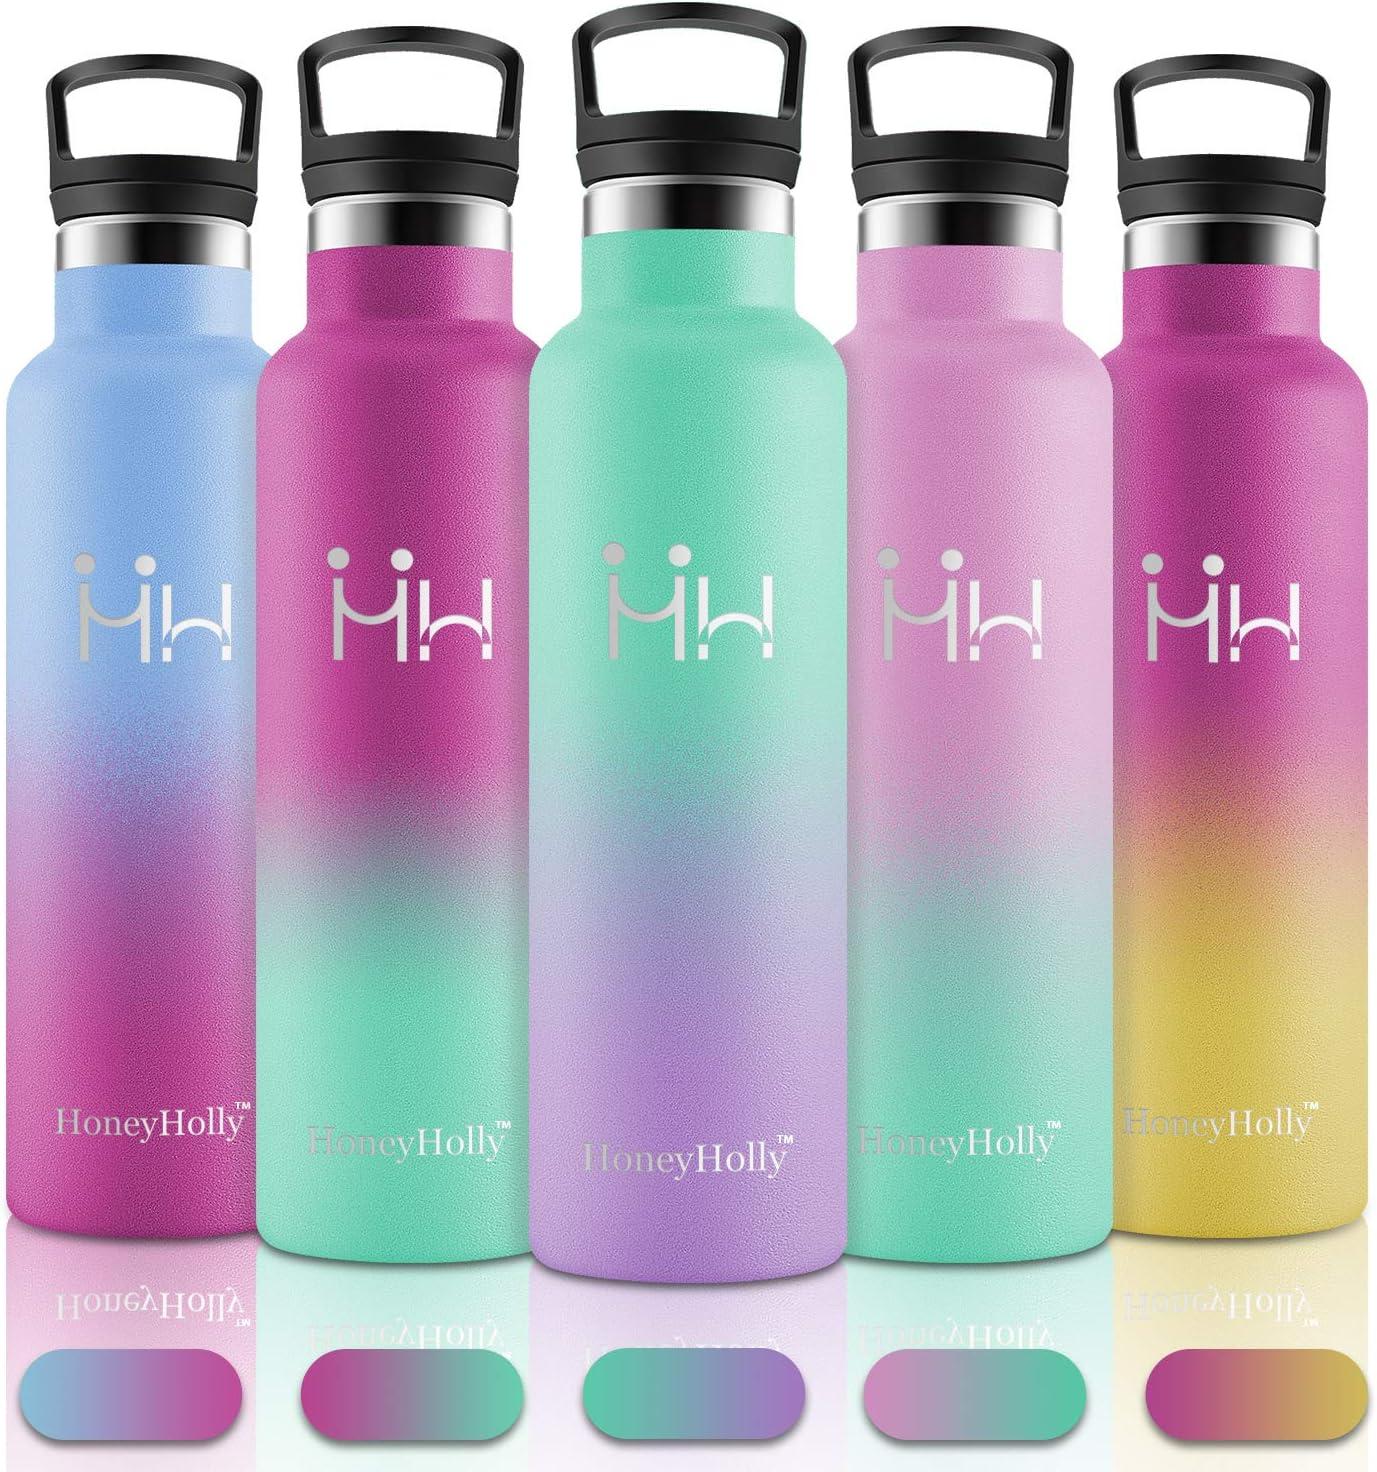 HoneyHolly Botellas Agua Acero Inoxidable, 750ml Reutilizable sin BPA Termos, Personalizada Cantimploras Botella para Niños, Bebé, Deportiva, Gimnasio, Bicicleta, Tazas Cafe Térmicas